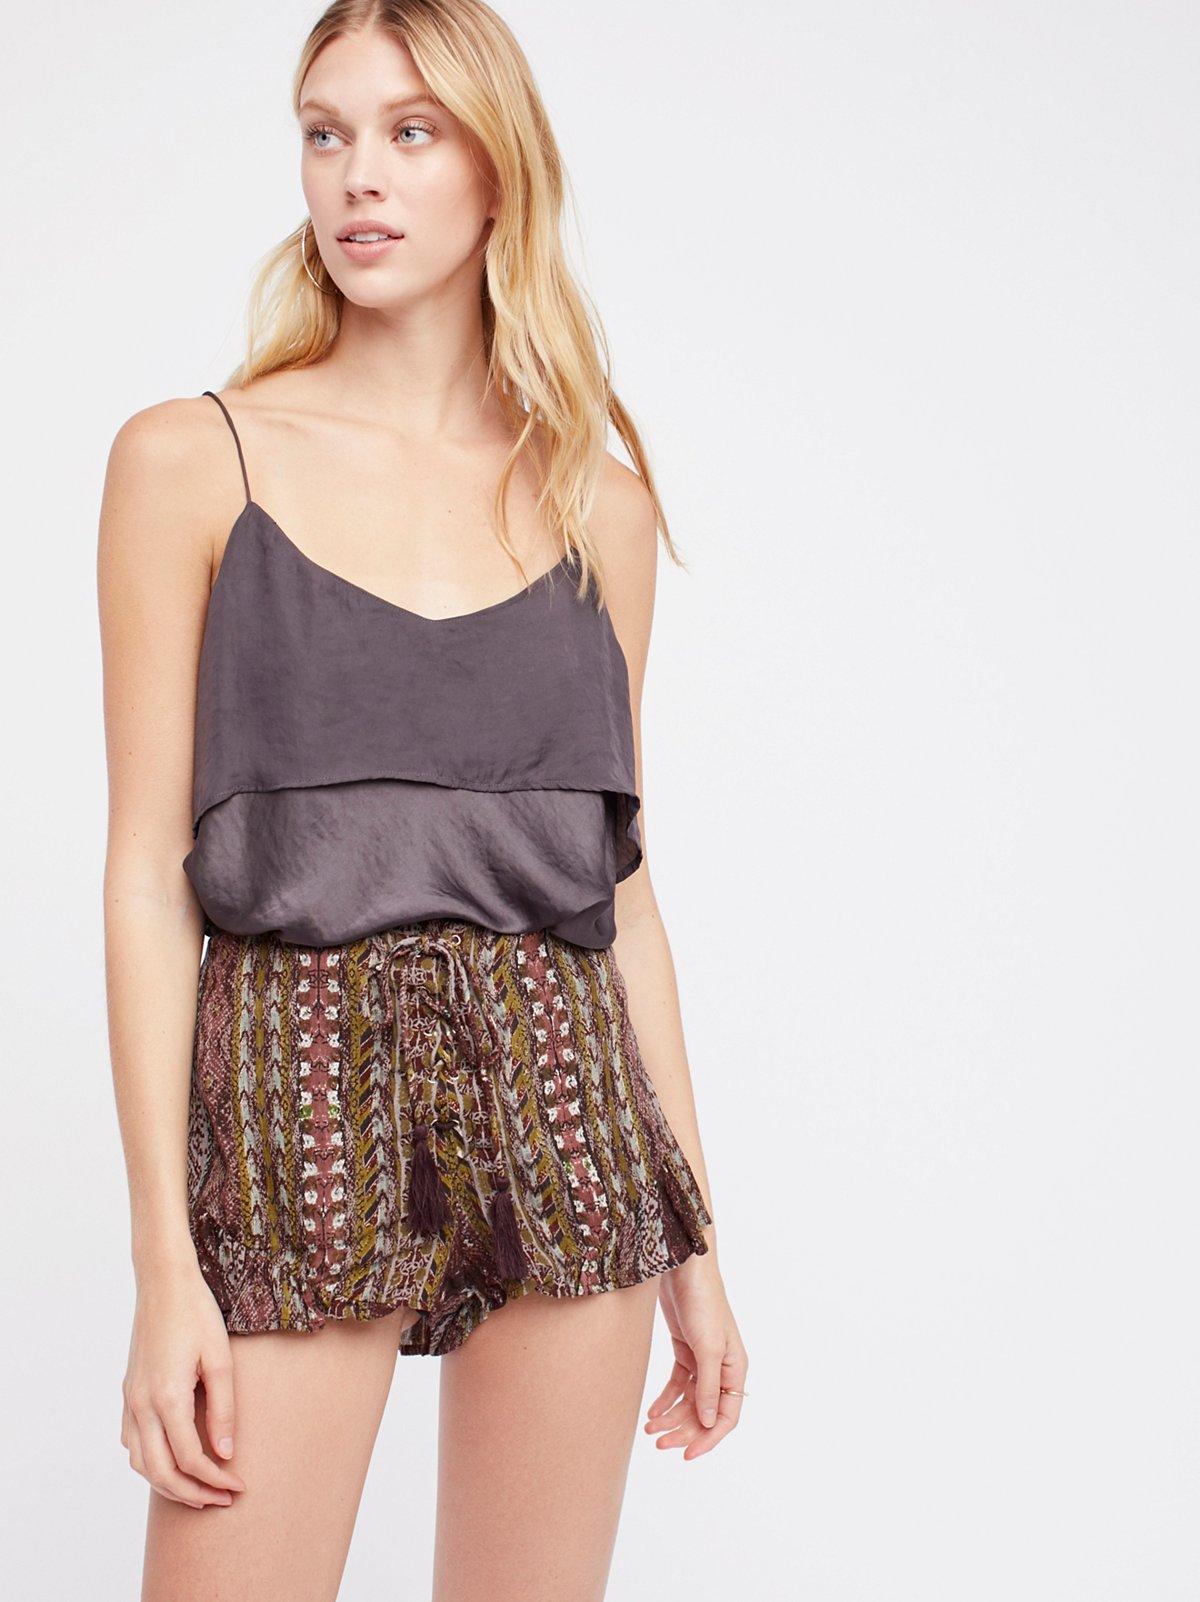 New Bohemian短裤